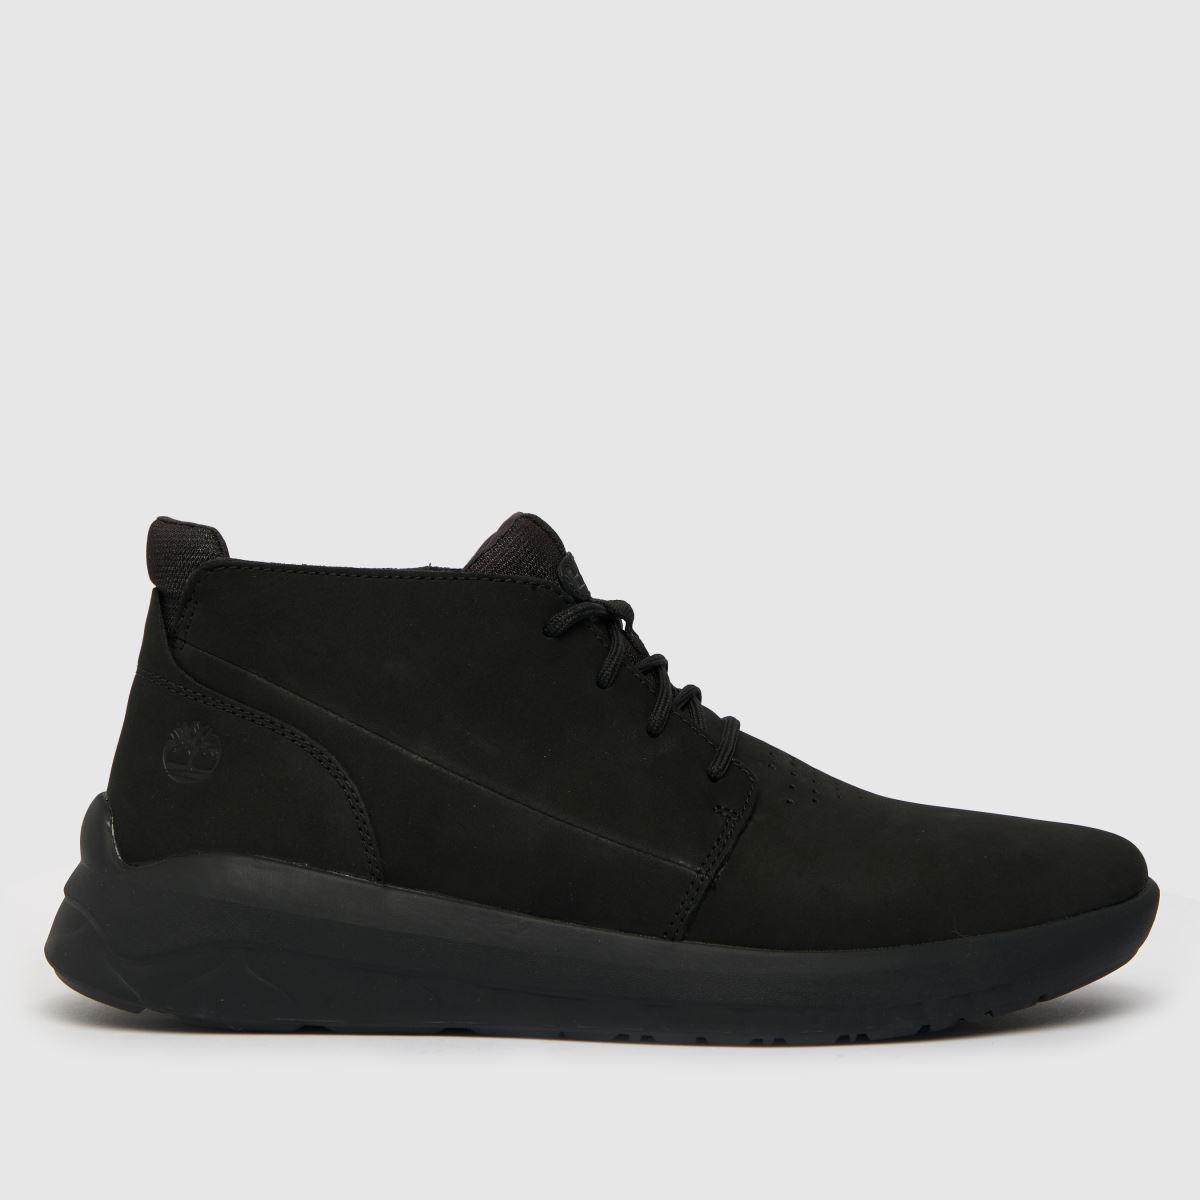 Timberland Black Bradstreet Ultra Boots